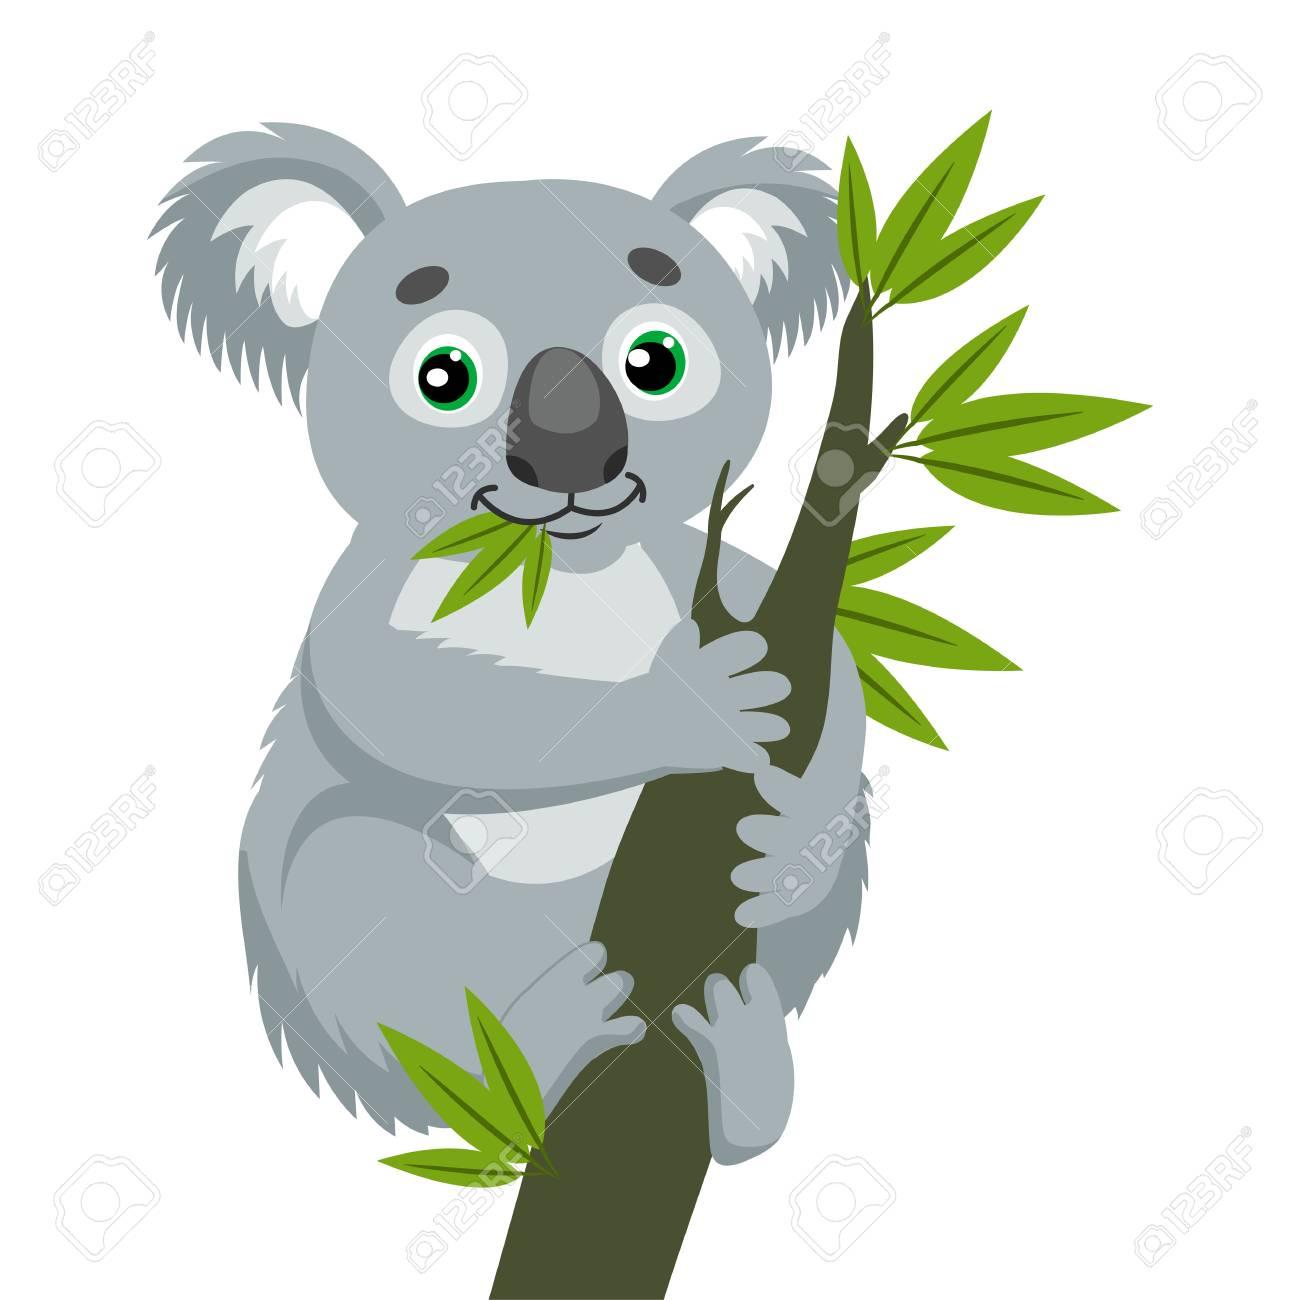 hight resolution of koala bear on wood branch with green leaves australian animal funniest koala sitting on eucalyptus